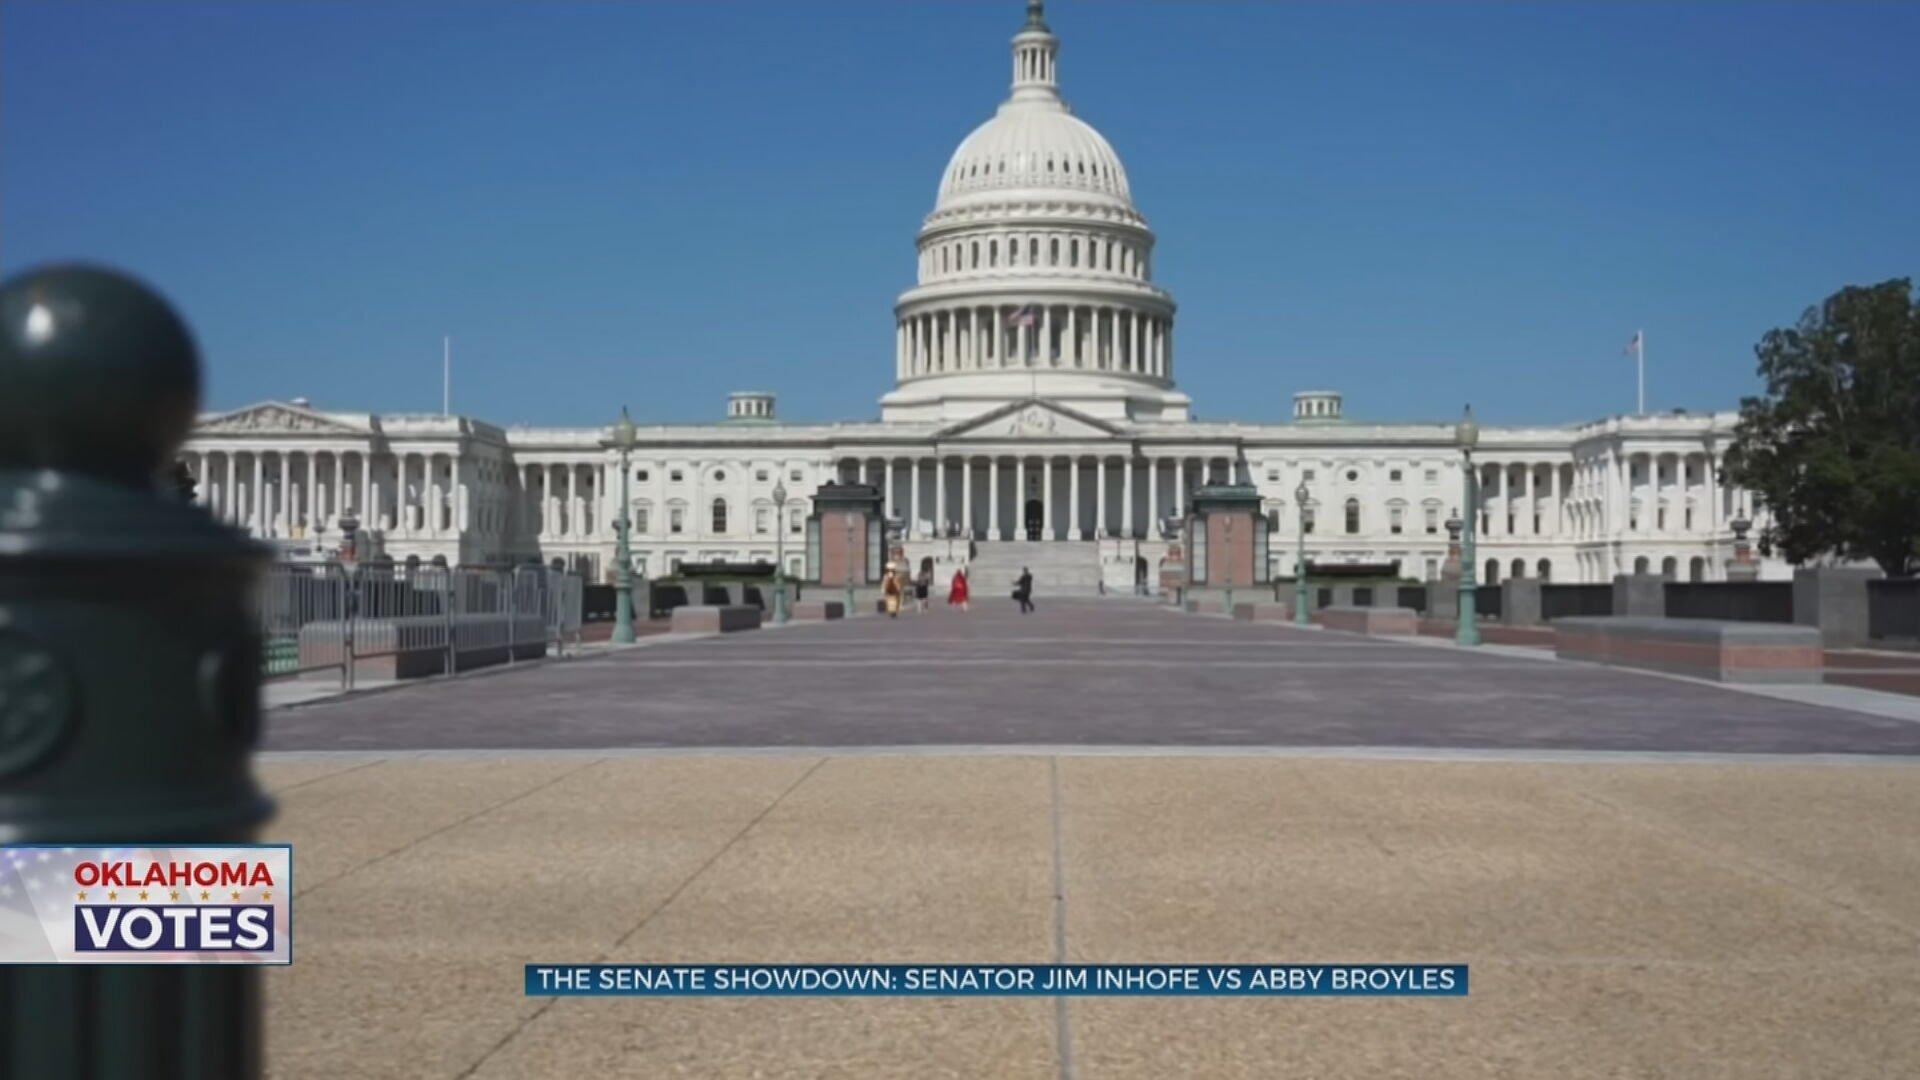 The Senate Showdown: Senator Jim Inhofe V. Abby Broyles